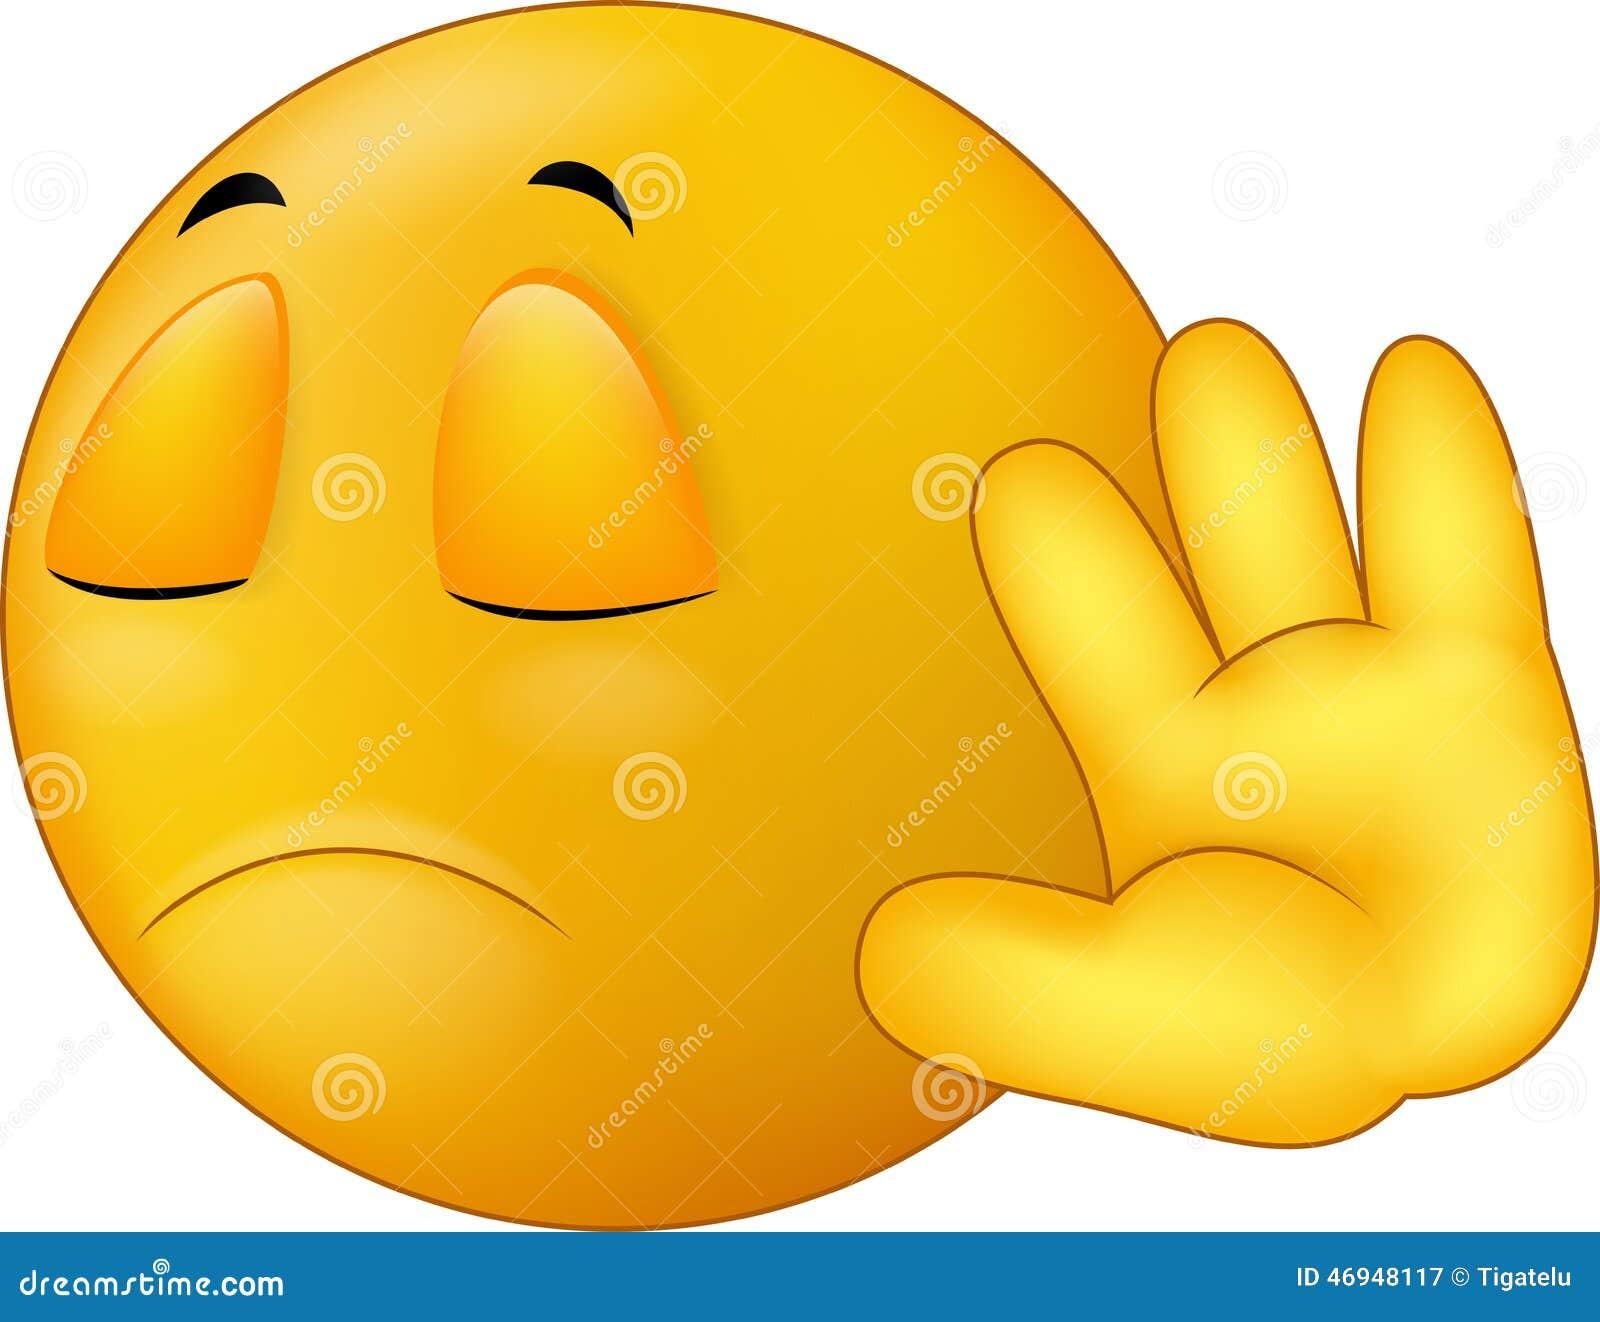 talk to my hand gesture smiley emoticon cartoon stock